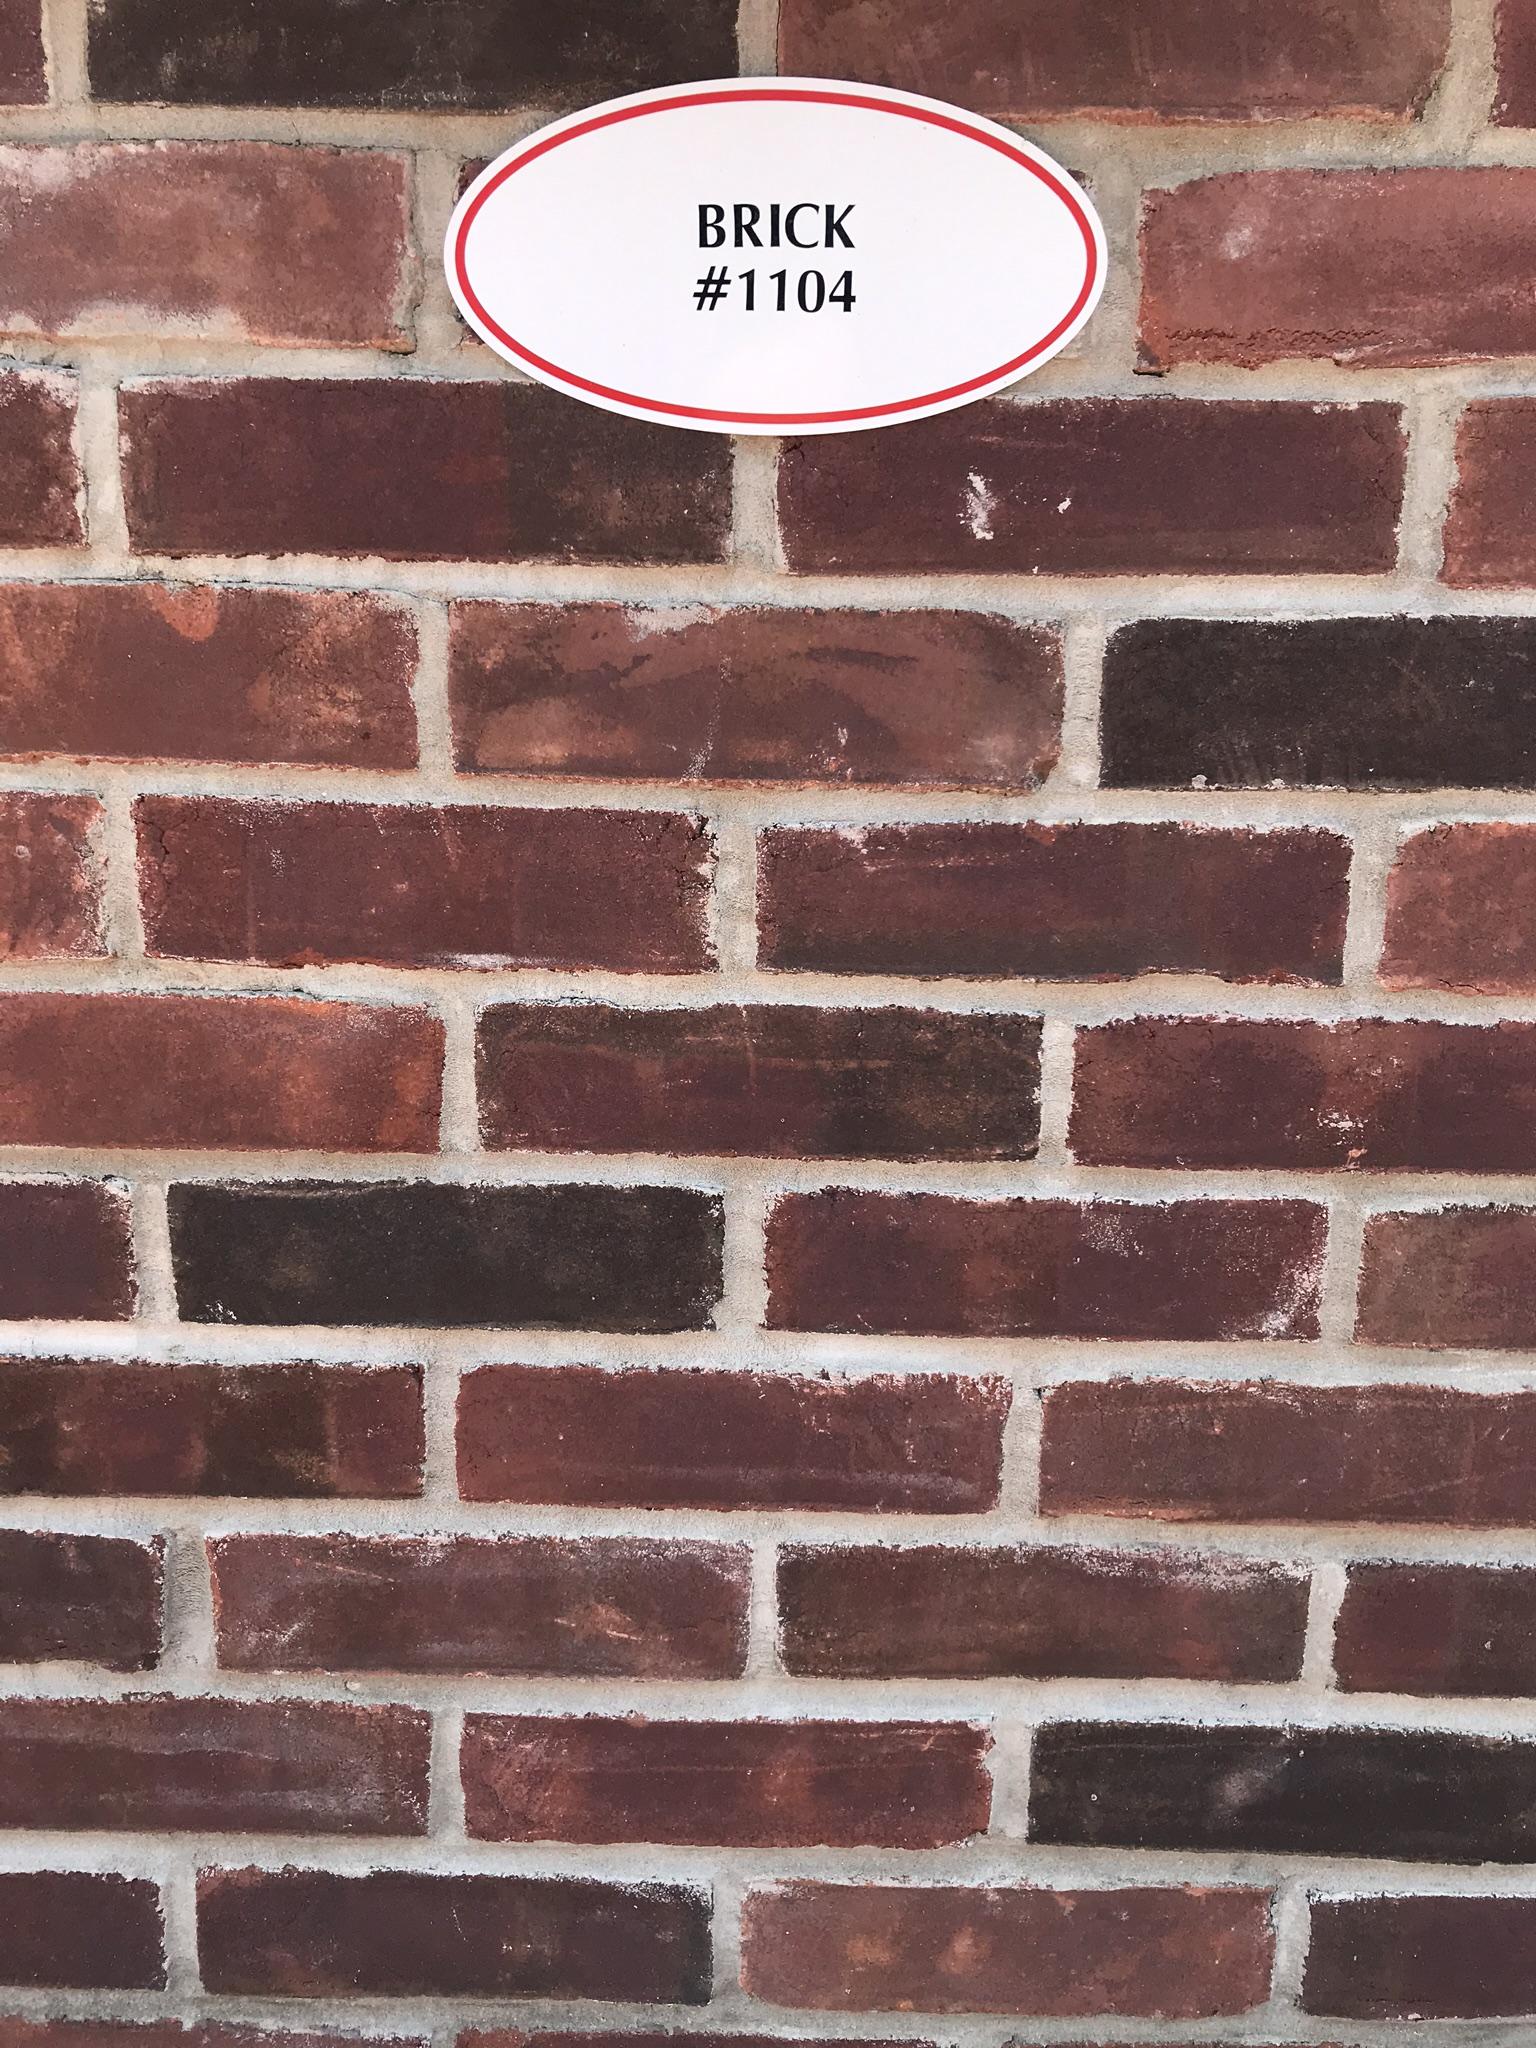 Brick #1104